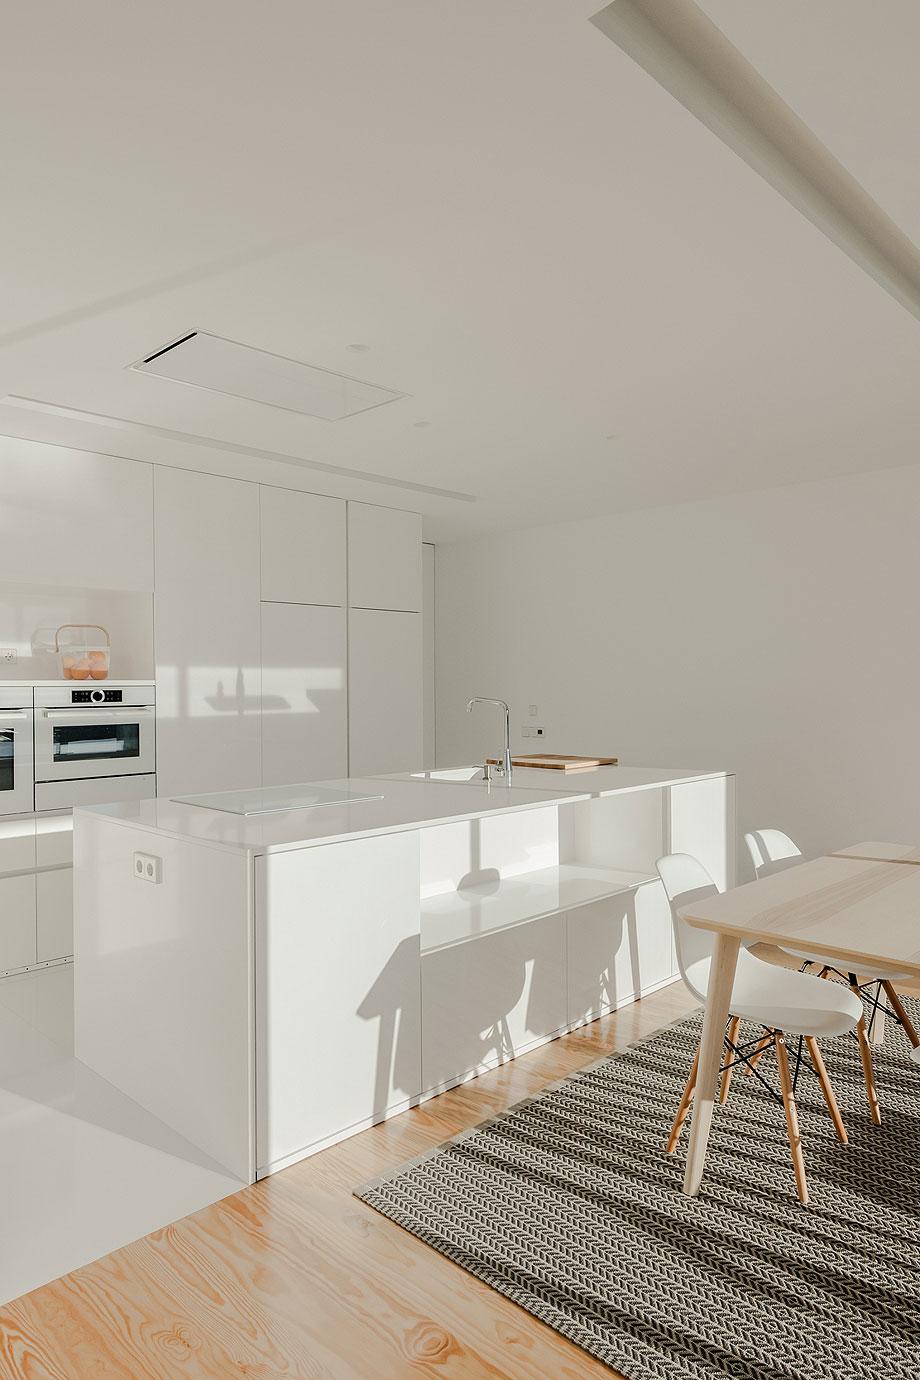 casa-touguinho-III-raulino-silva-arquitecto (4)